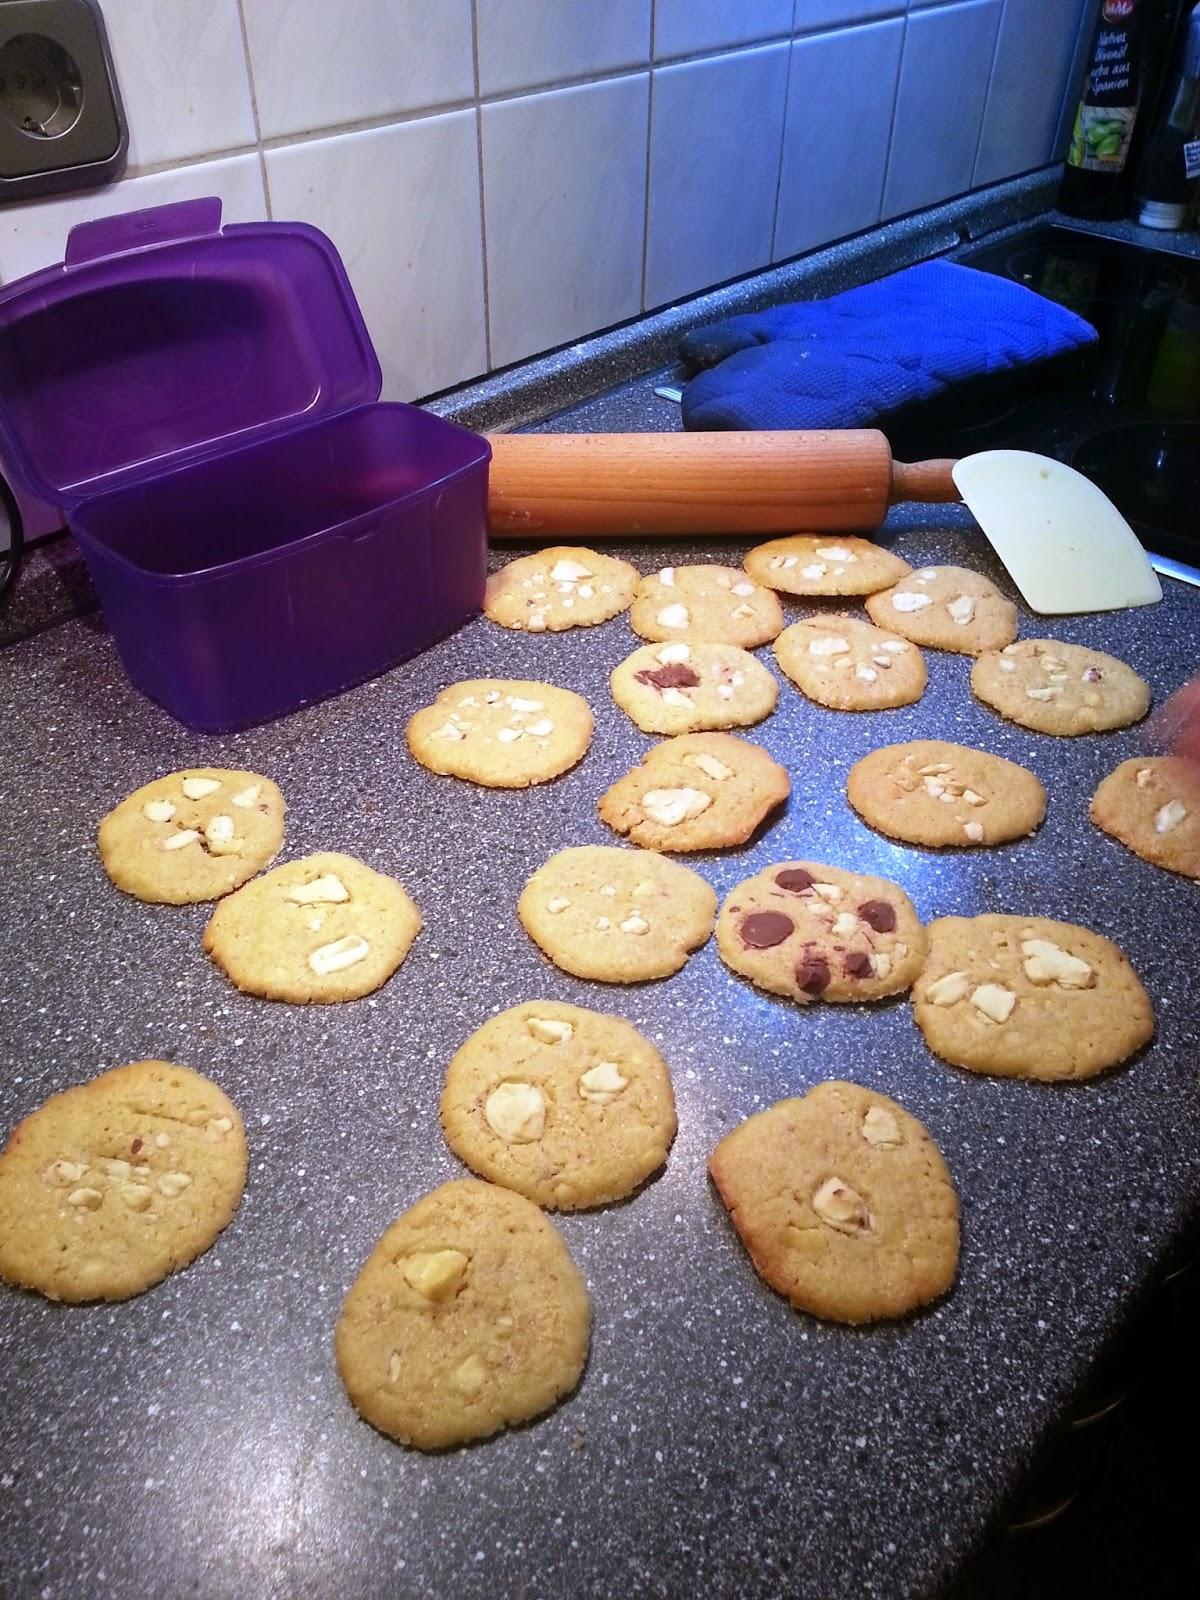 carpe culina in der weihnachtsb ckerei american cookies. Black Bedroom Furniture Sets. Home Design Ideas